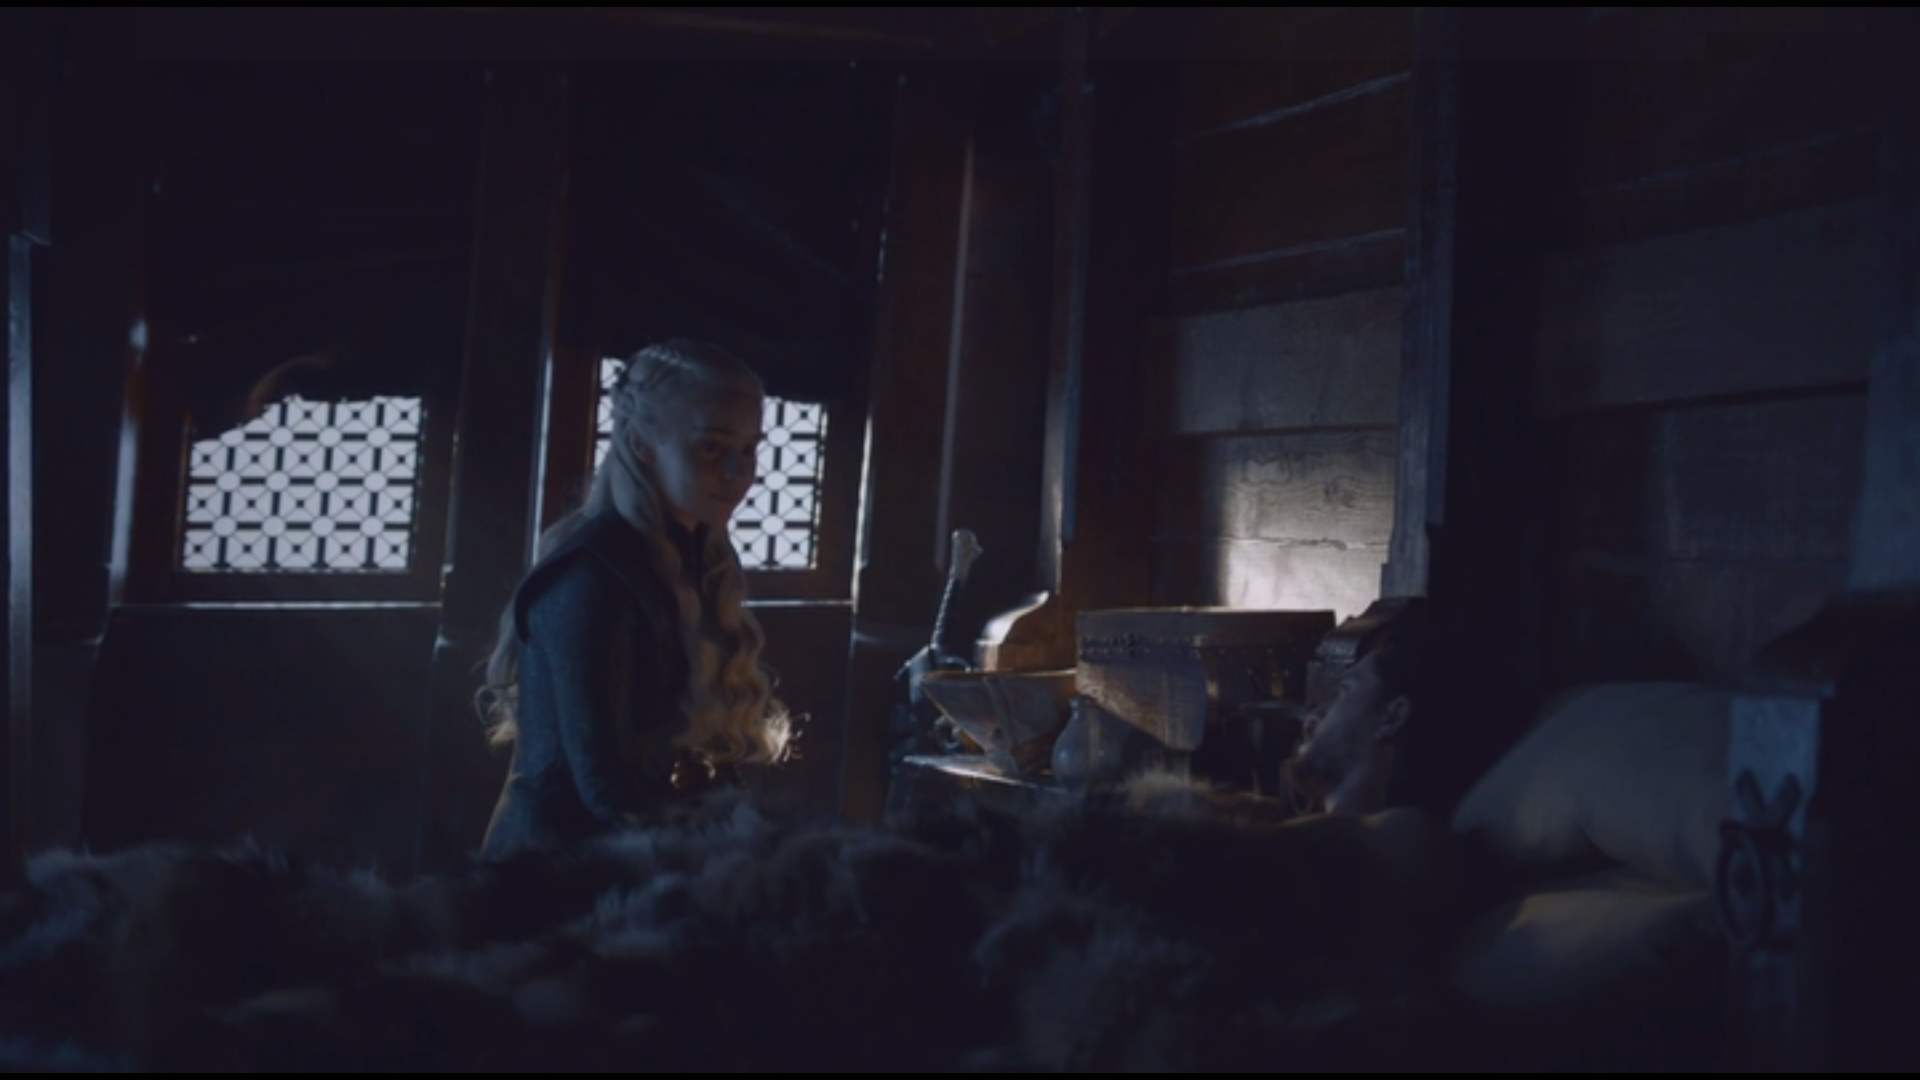 Jon snow calls Dany